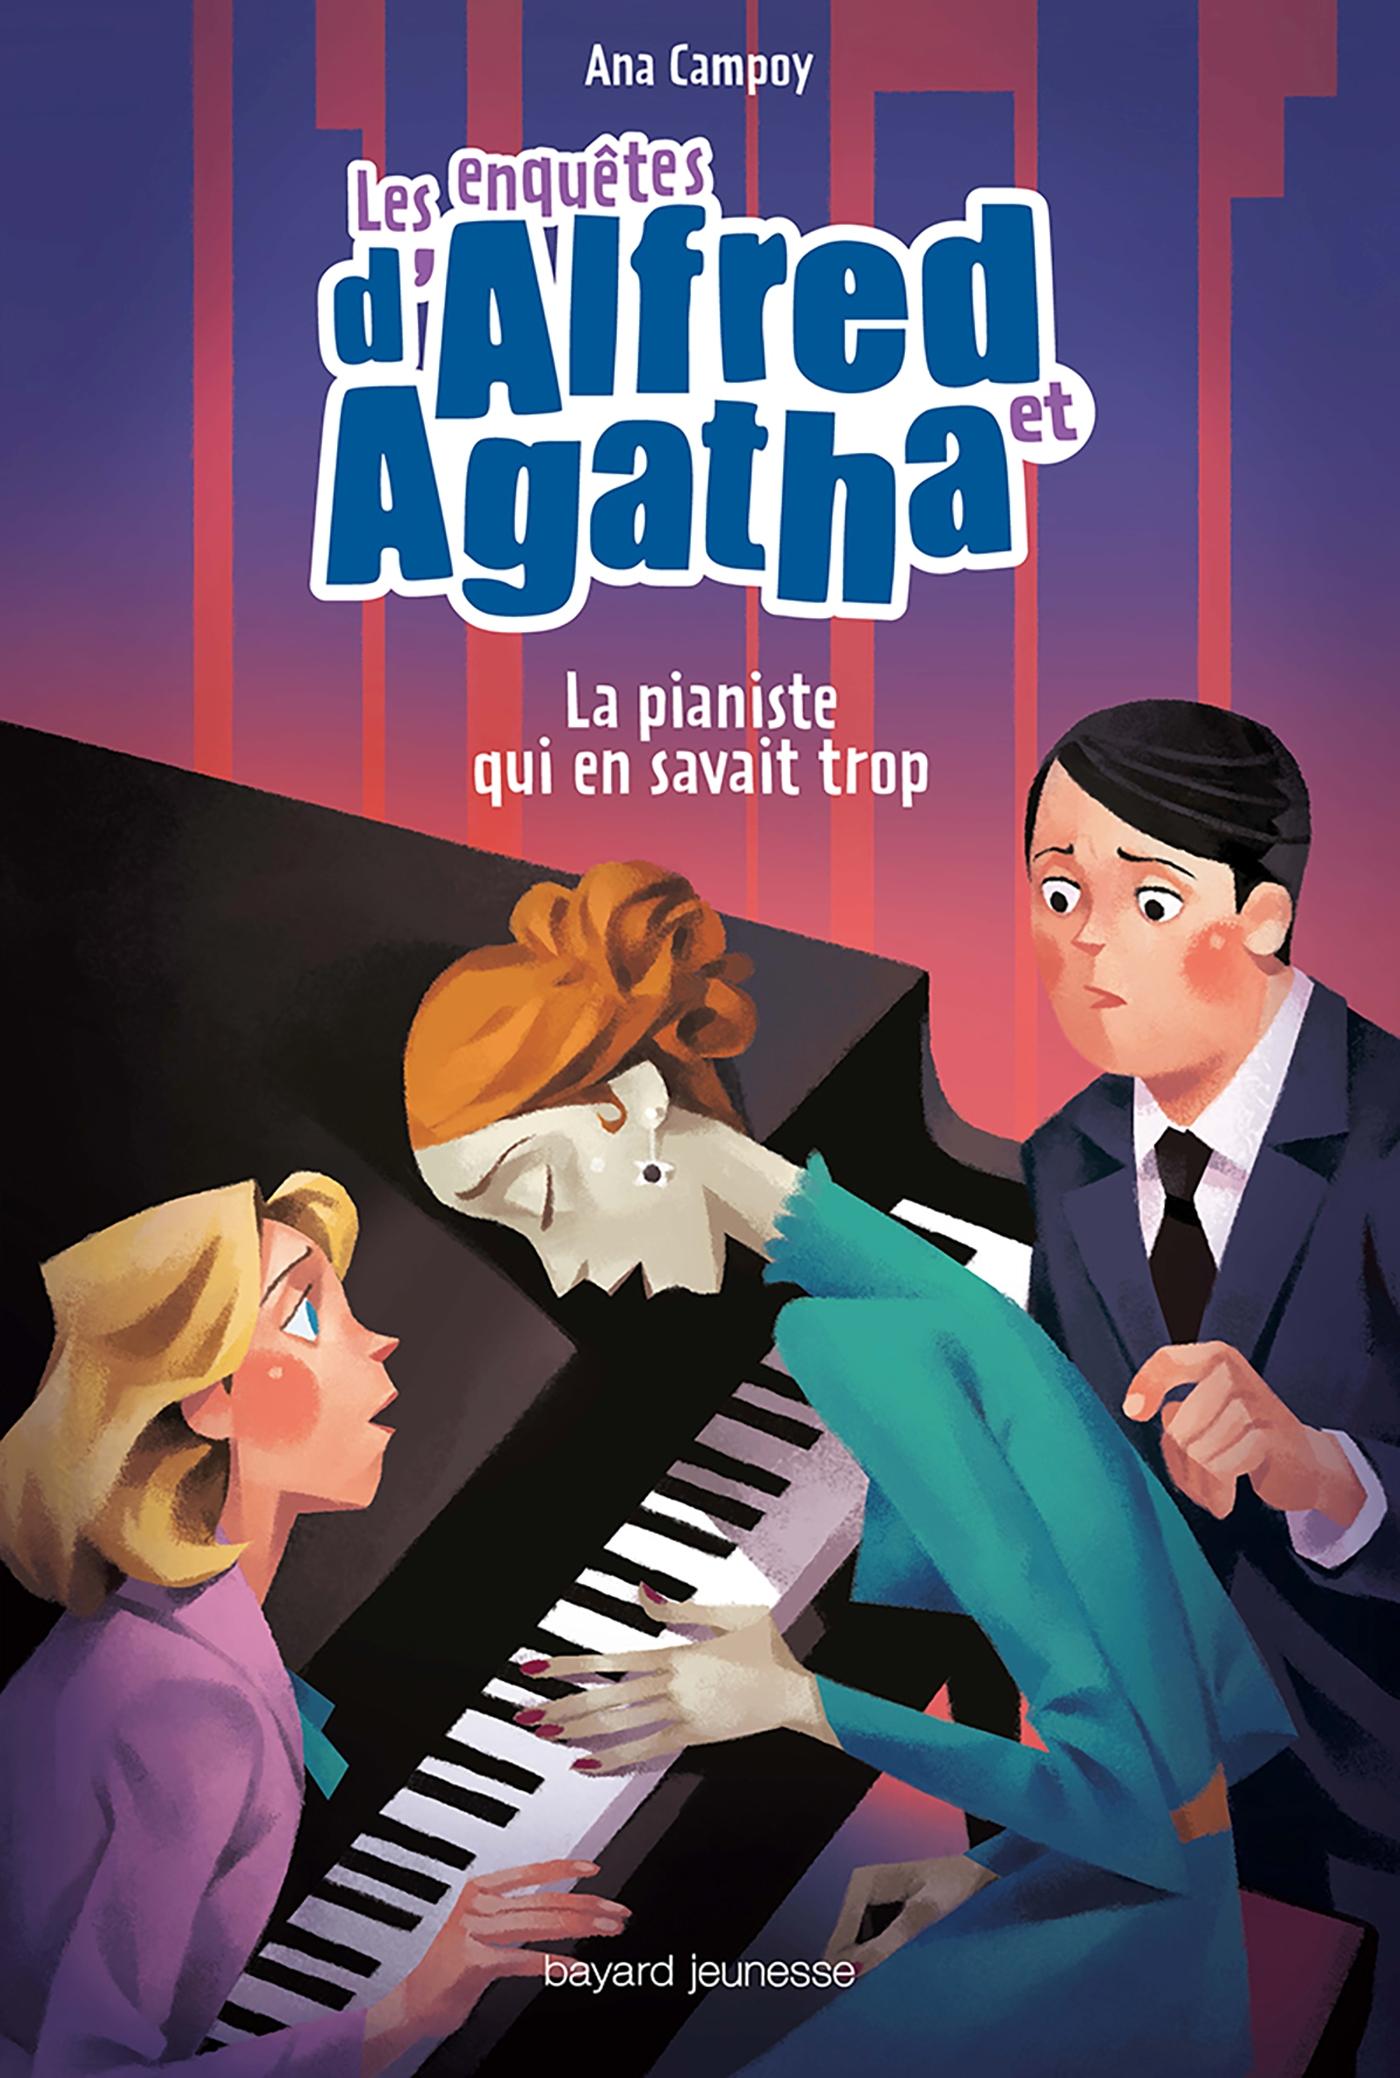 La pianiste qui en savait trop | Campoy, Ana